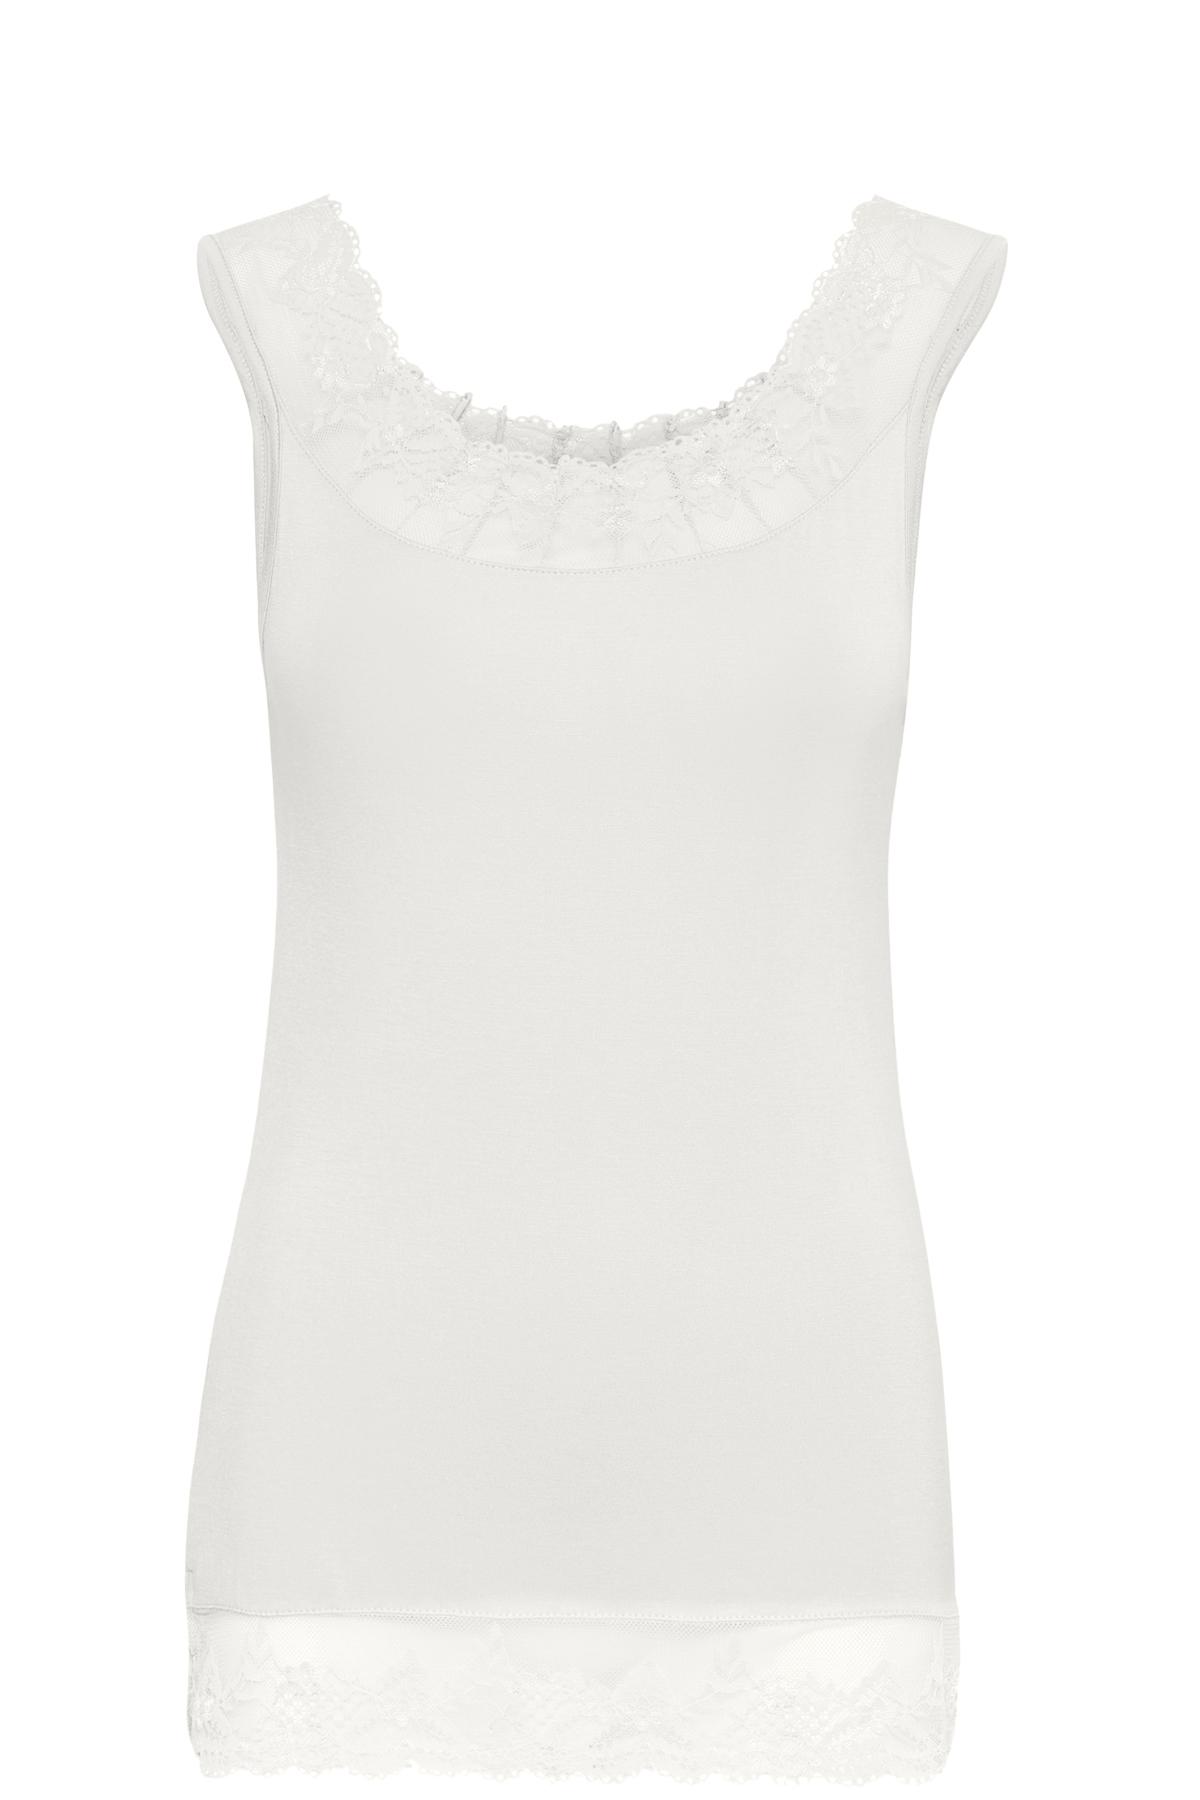 Image of   Cream Dame Ærmeløs top - Off-white